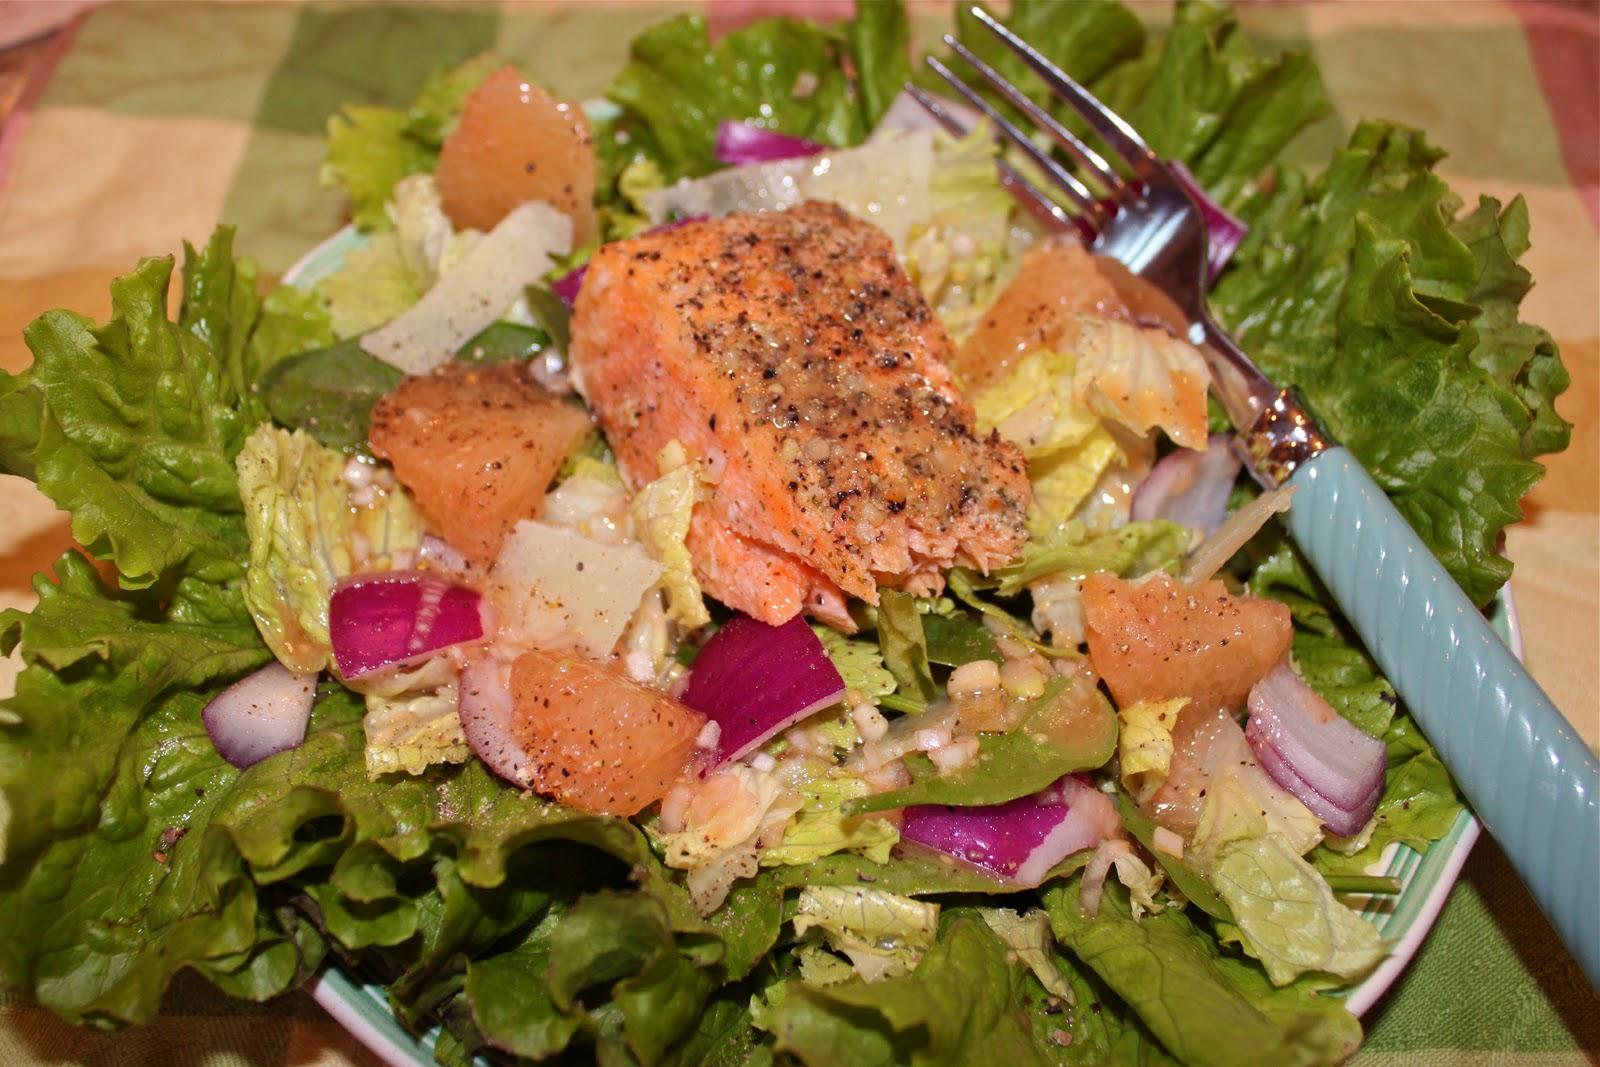 Blood Orange Vinaigrette on Salmon Salad - La Bella Vita Cucina